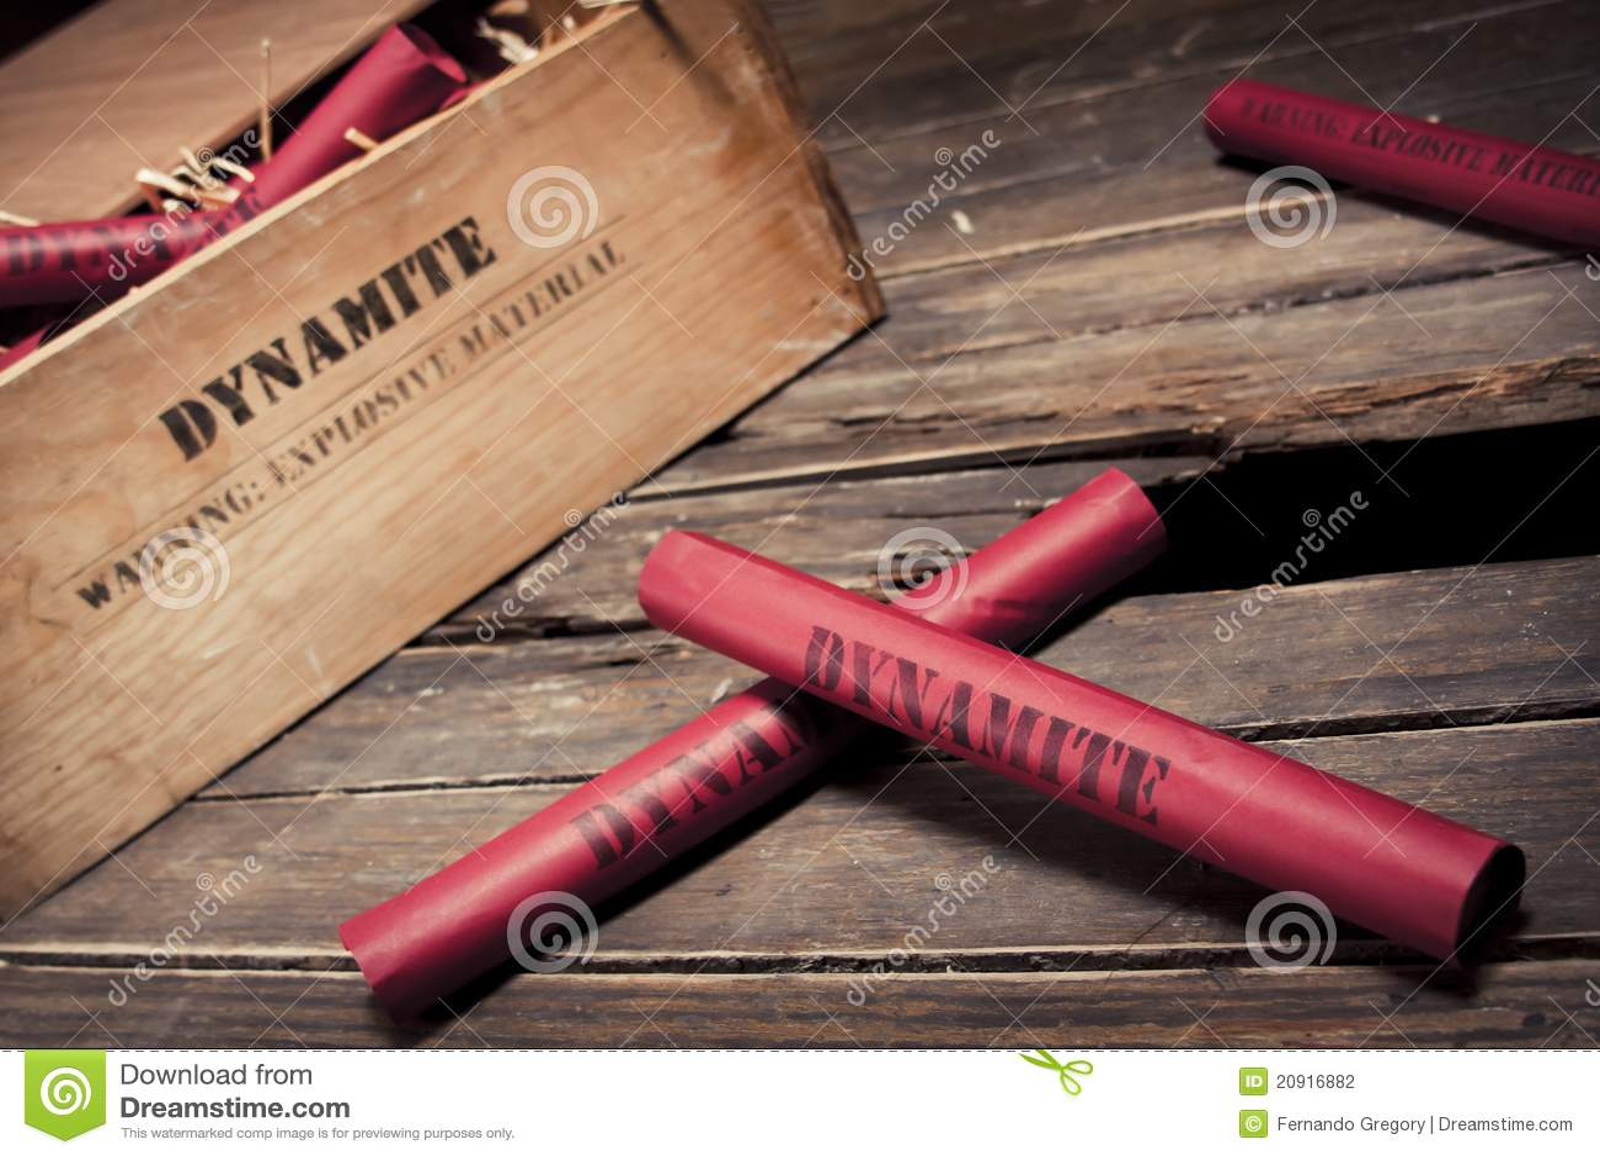 [Image: dangerous-dynamite-sticks-wooden-box-20916882.jpg]